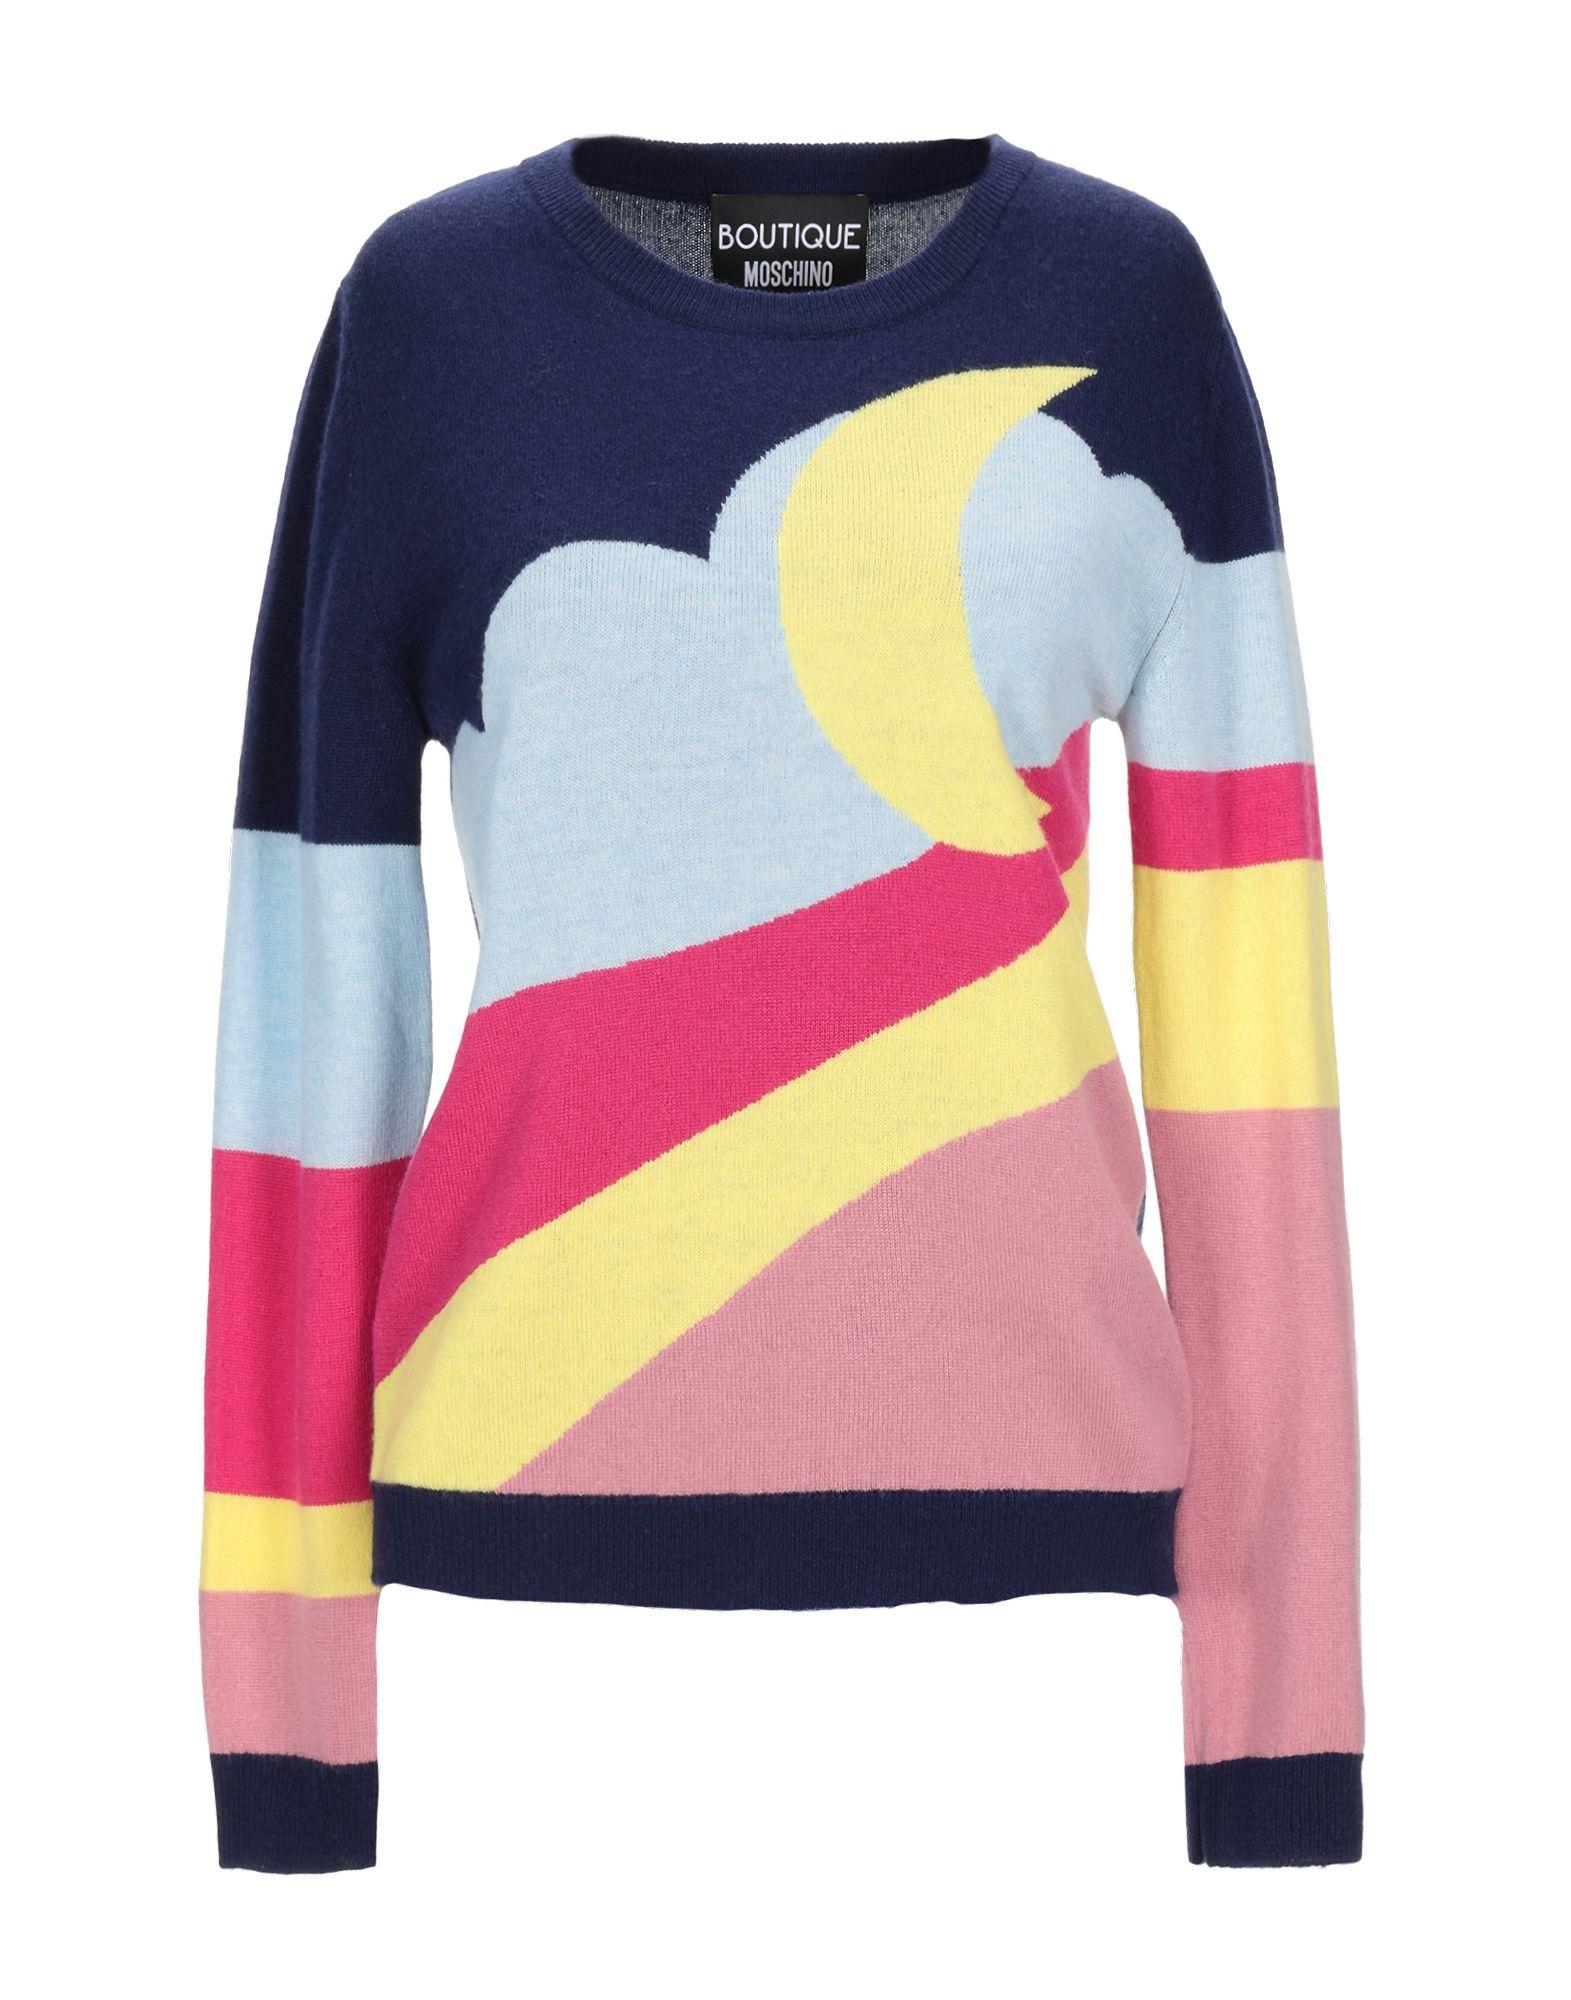 MOSCHINO | BOUTIQUE MOSCHINO Sweaters 39948199 | Goxip